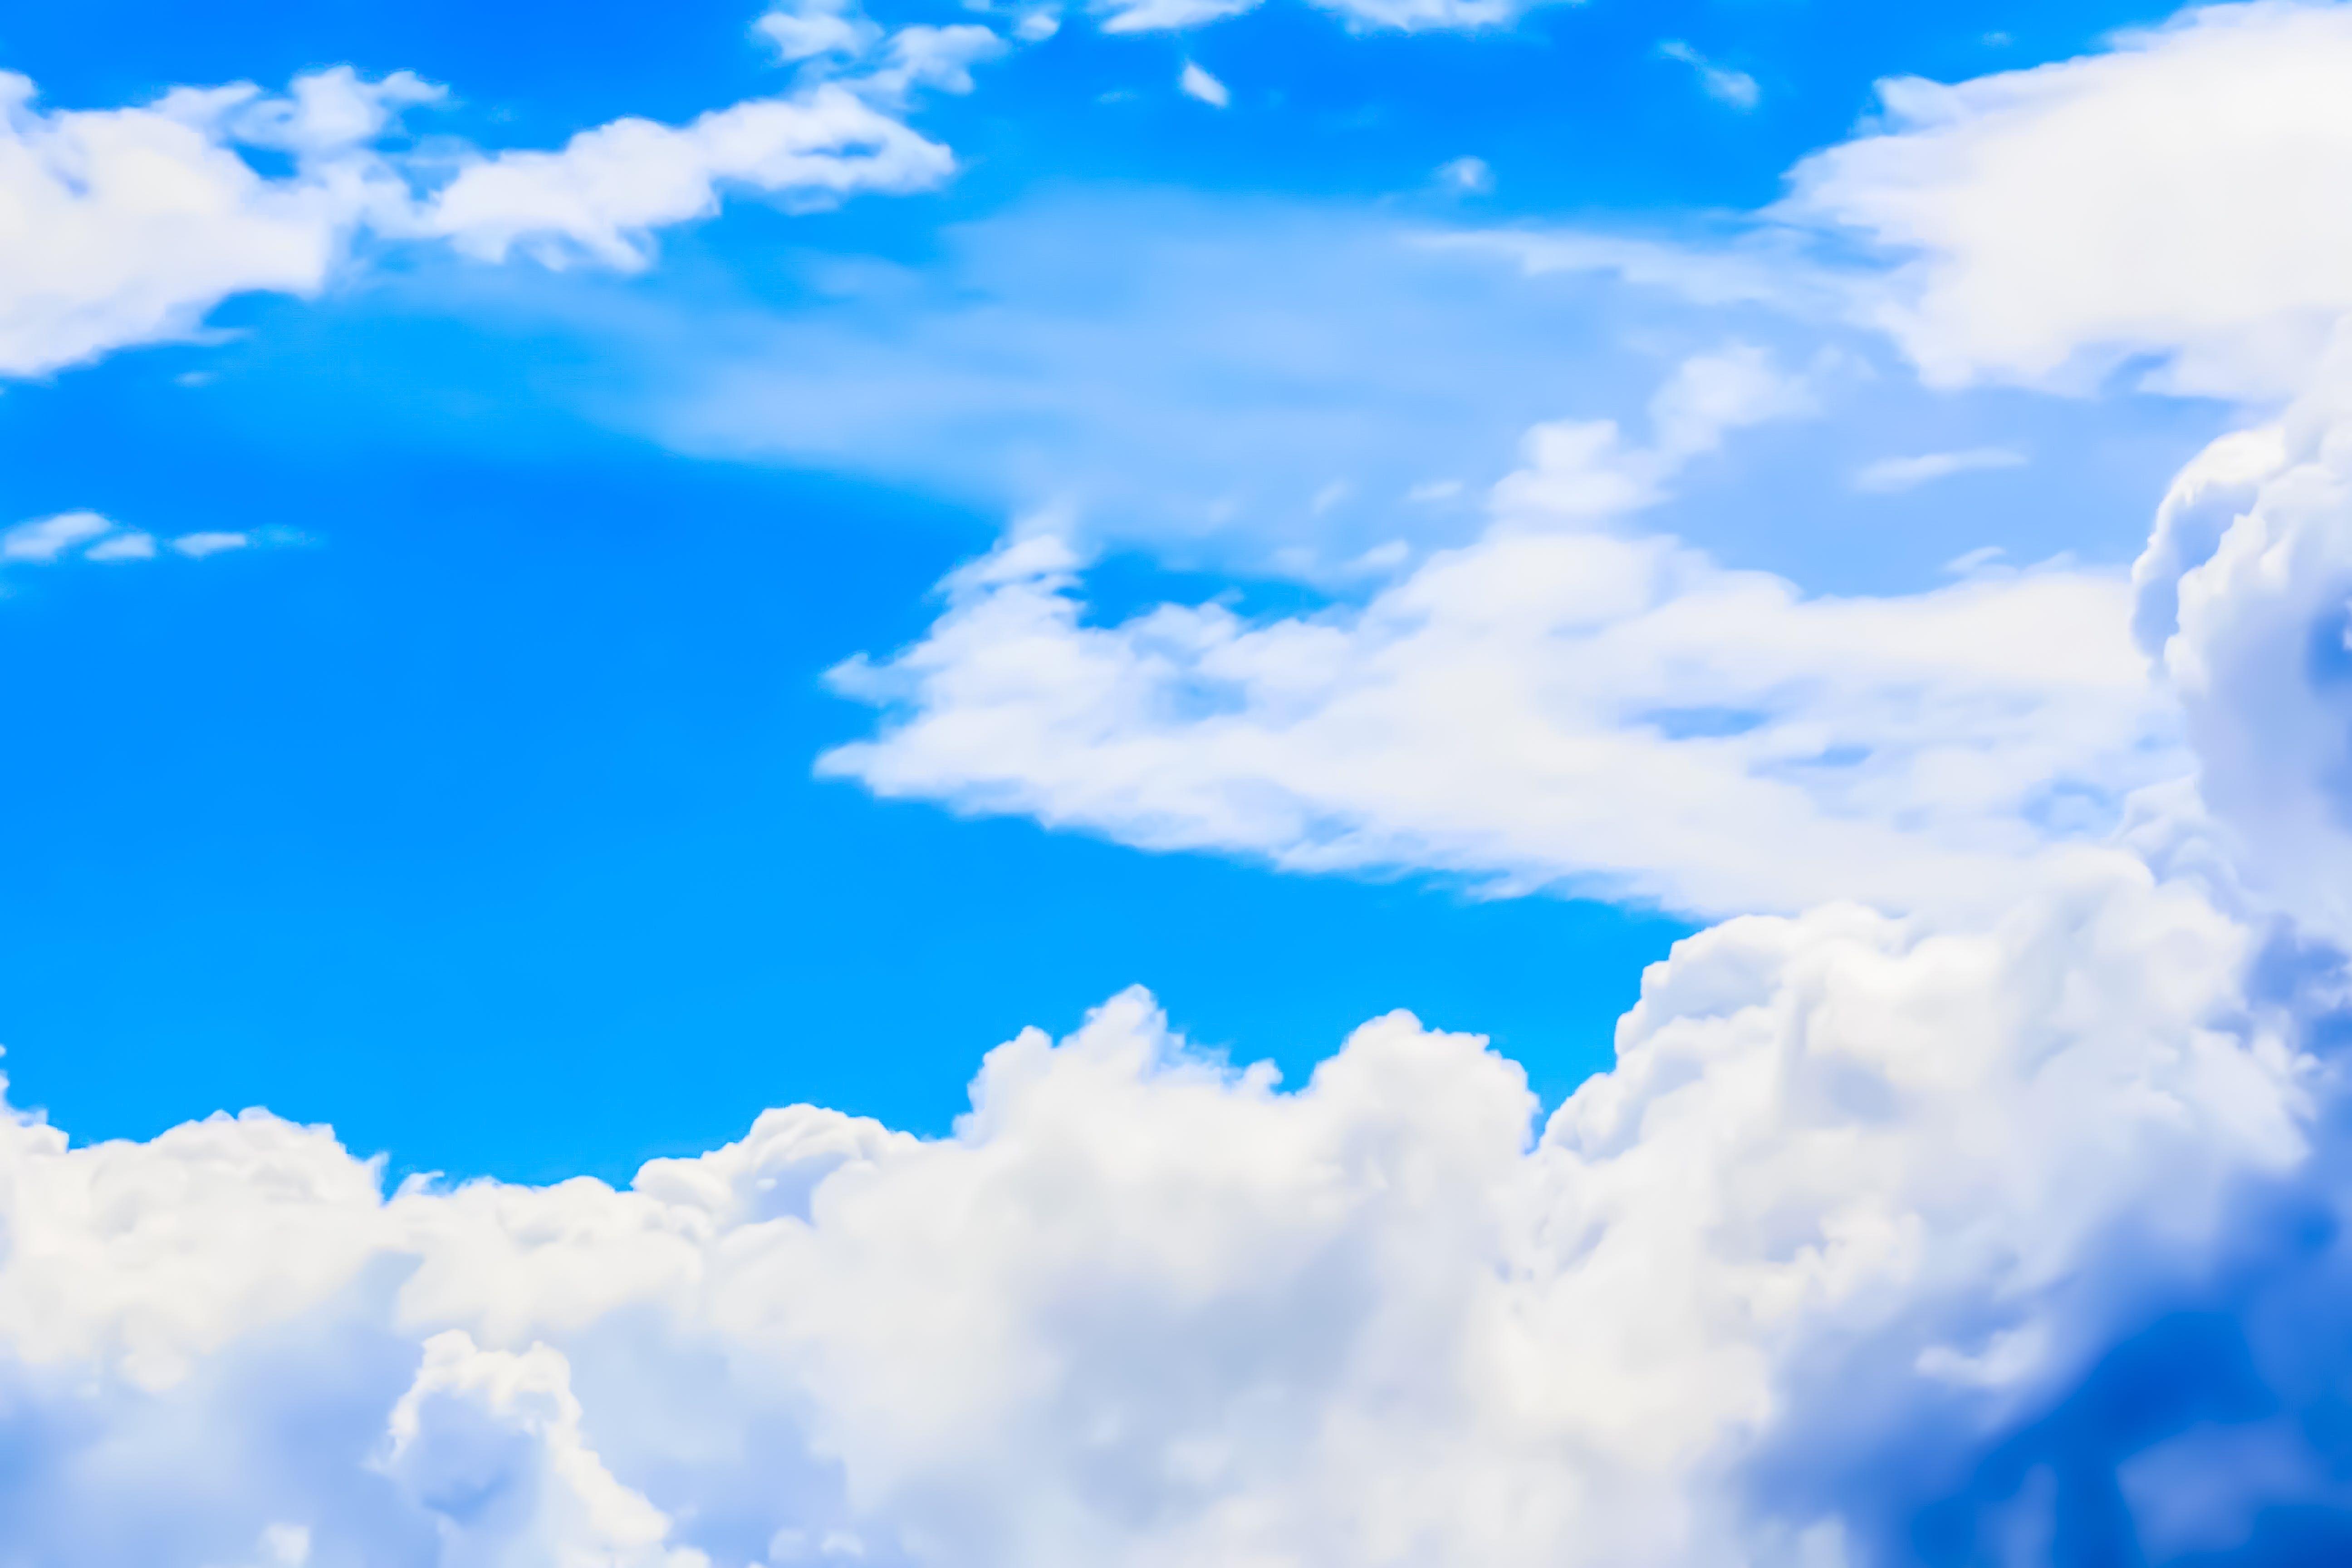 Kostenloses Stock Foto zu blauer himmel, himmel, klarer himmel, milchige wolken